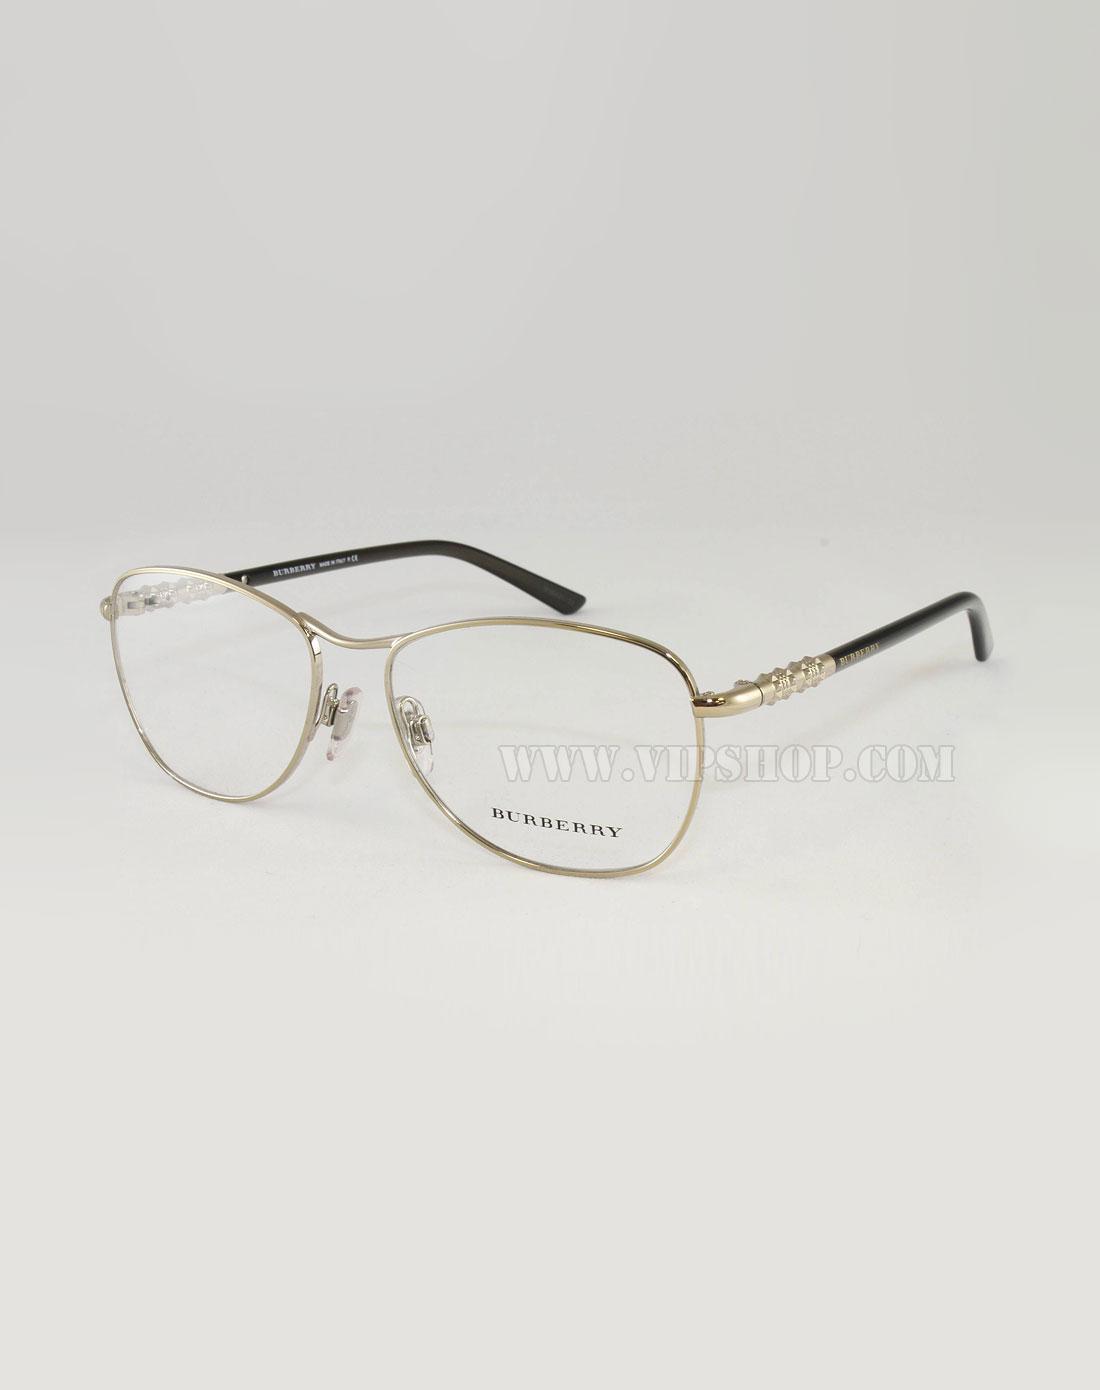 burberry 女款金属边框眼镜架淡金/黑色